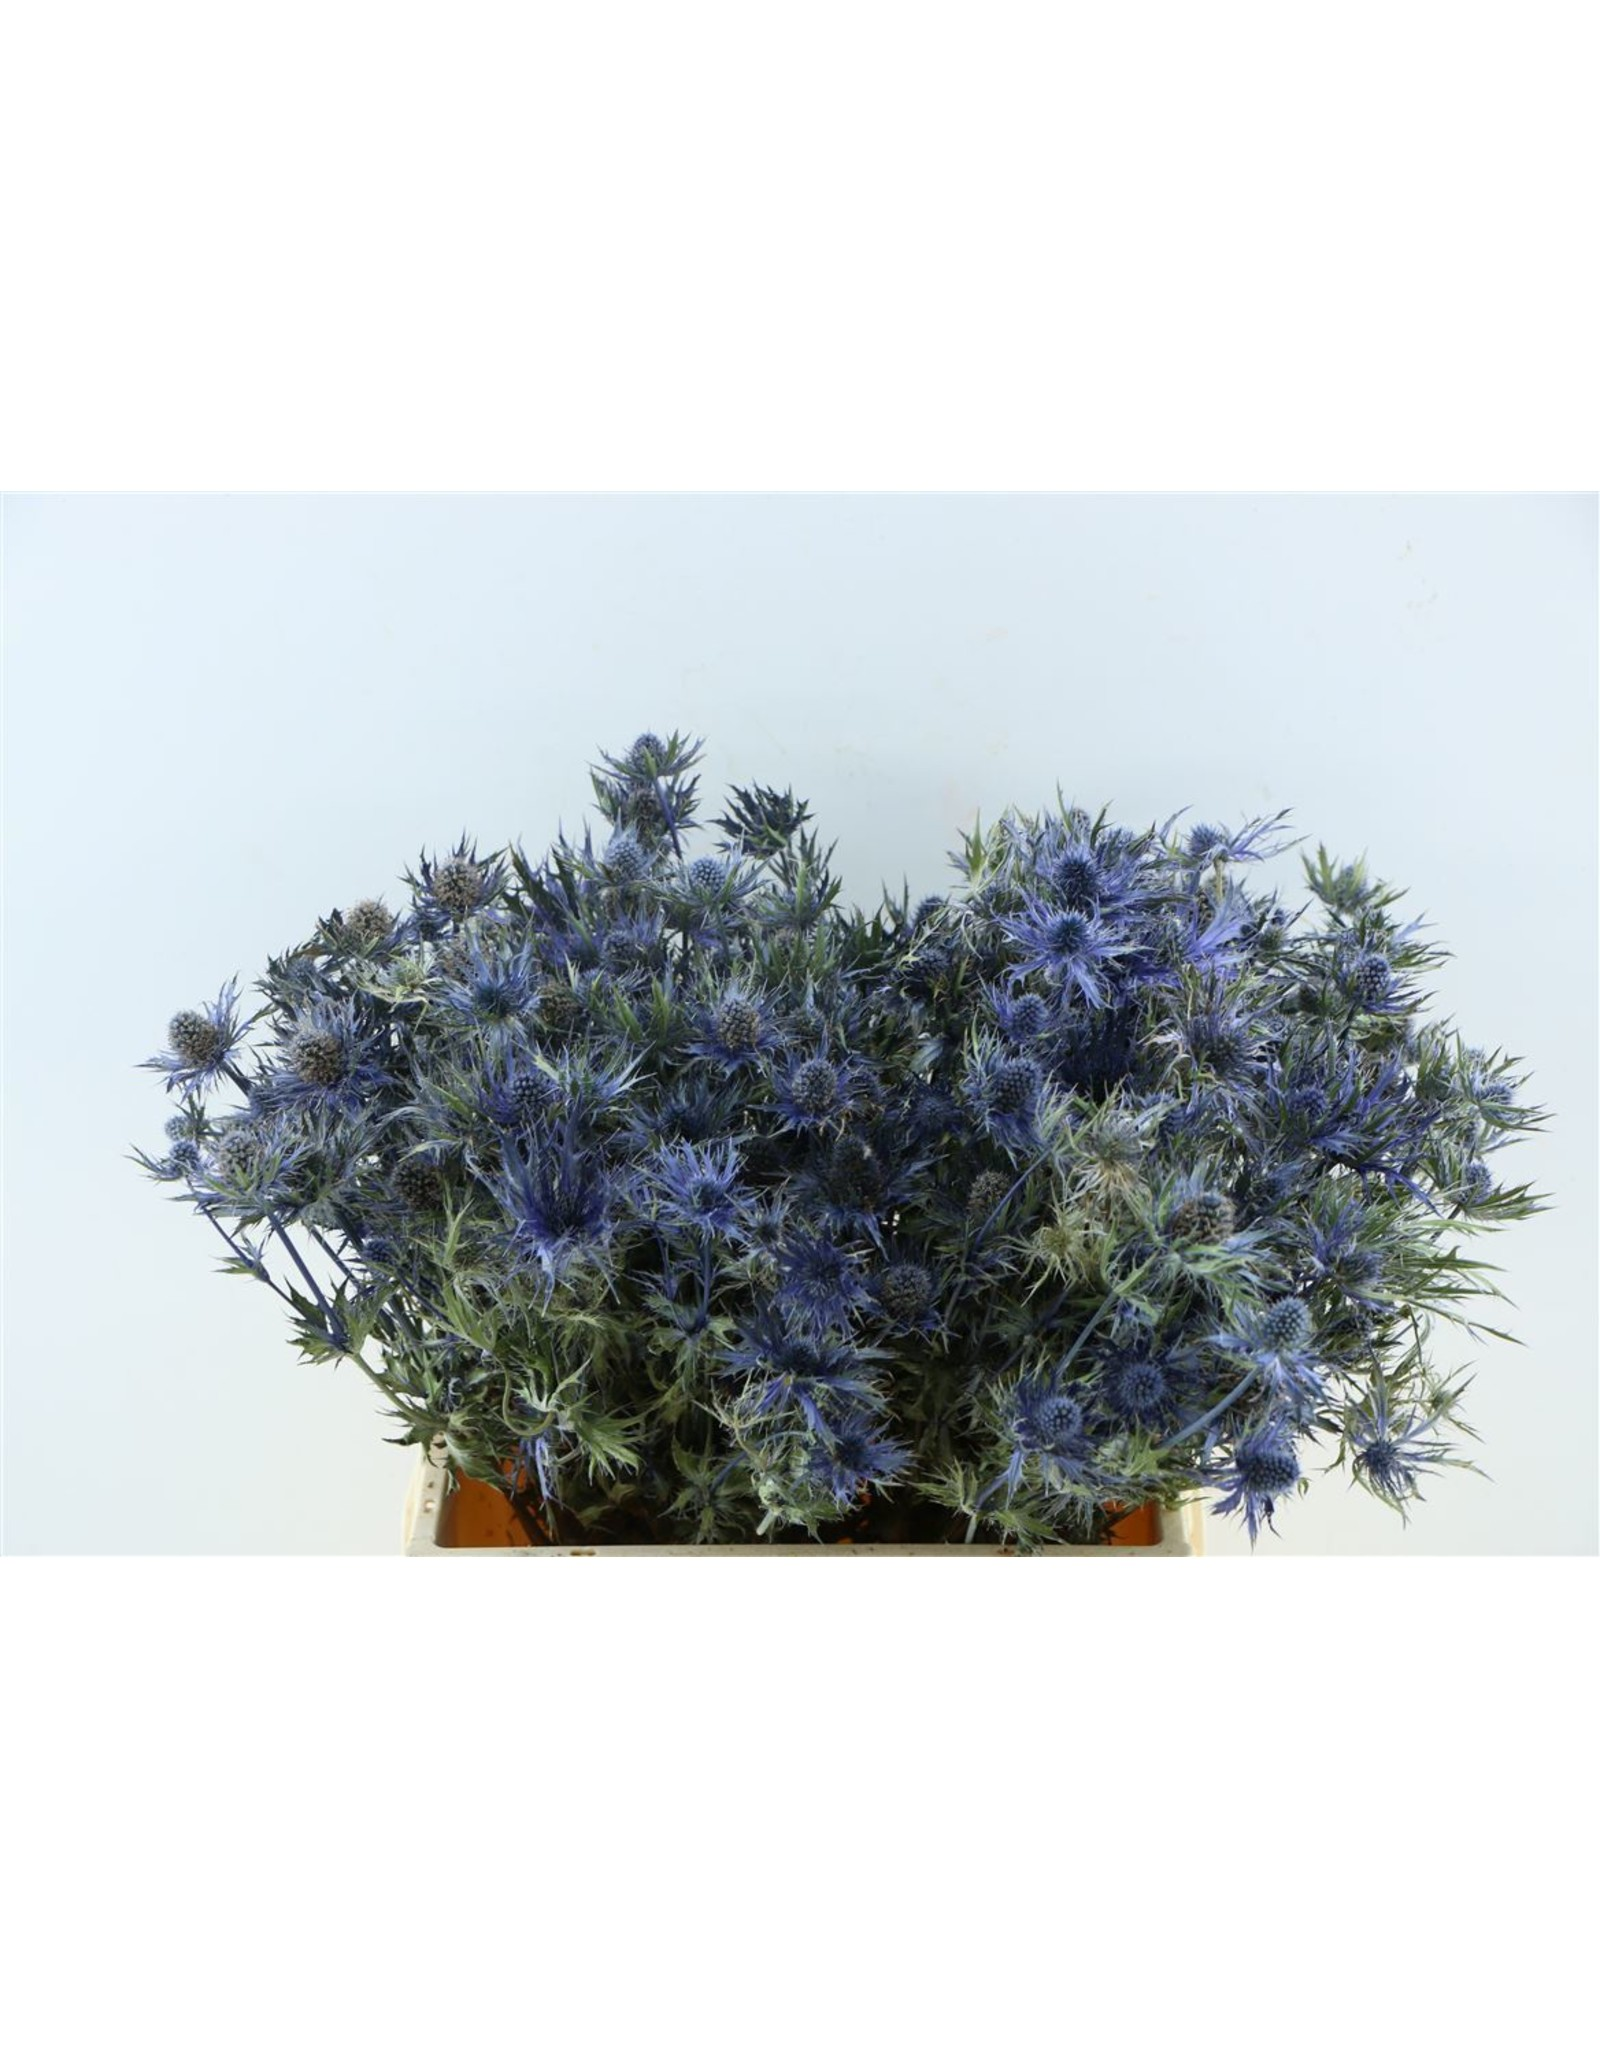 Dried Eryngium Blauw Kort Pbs x 2